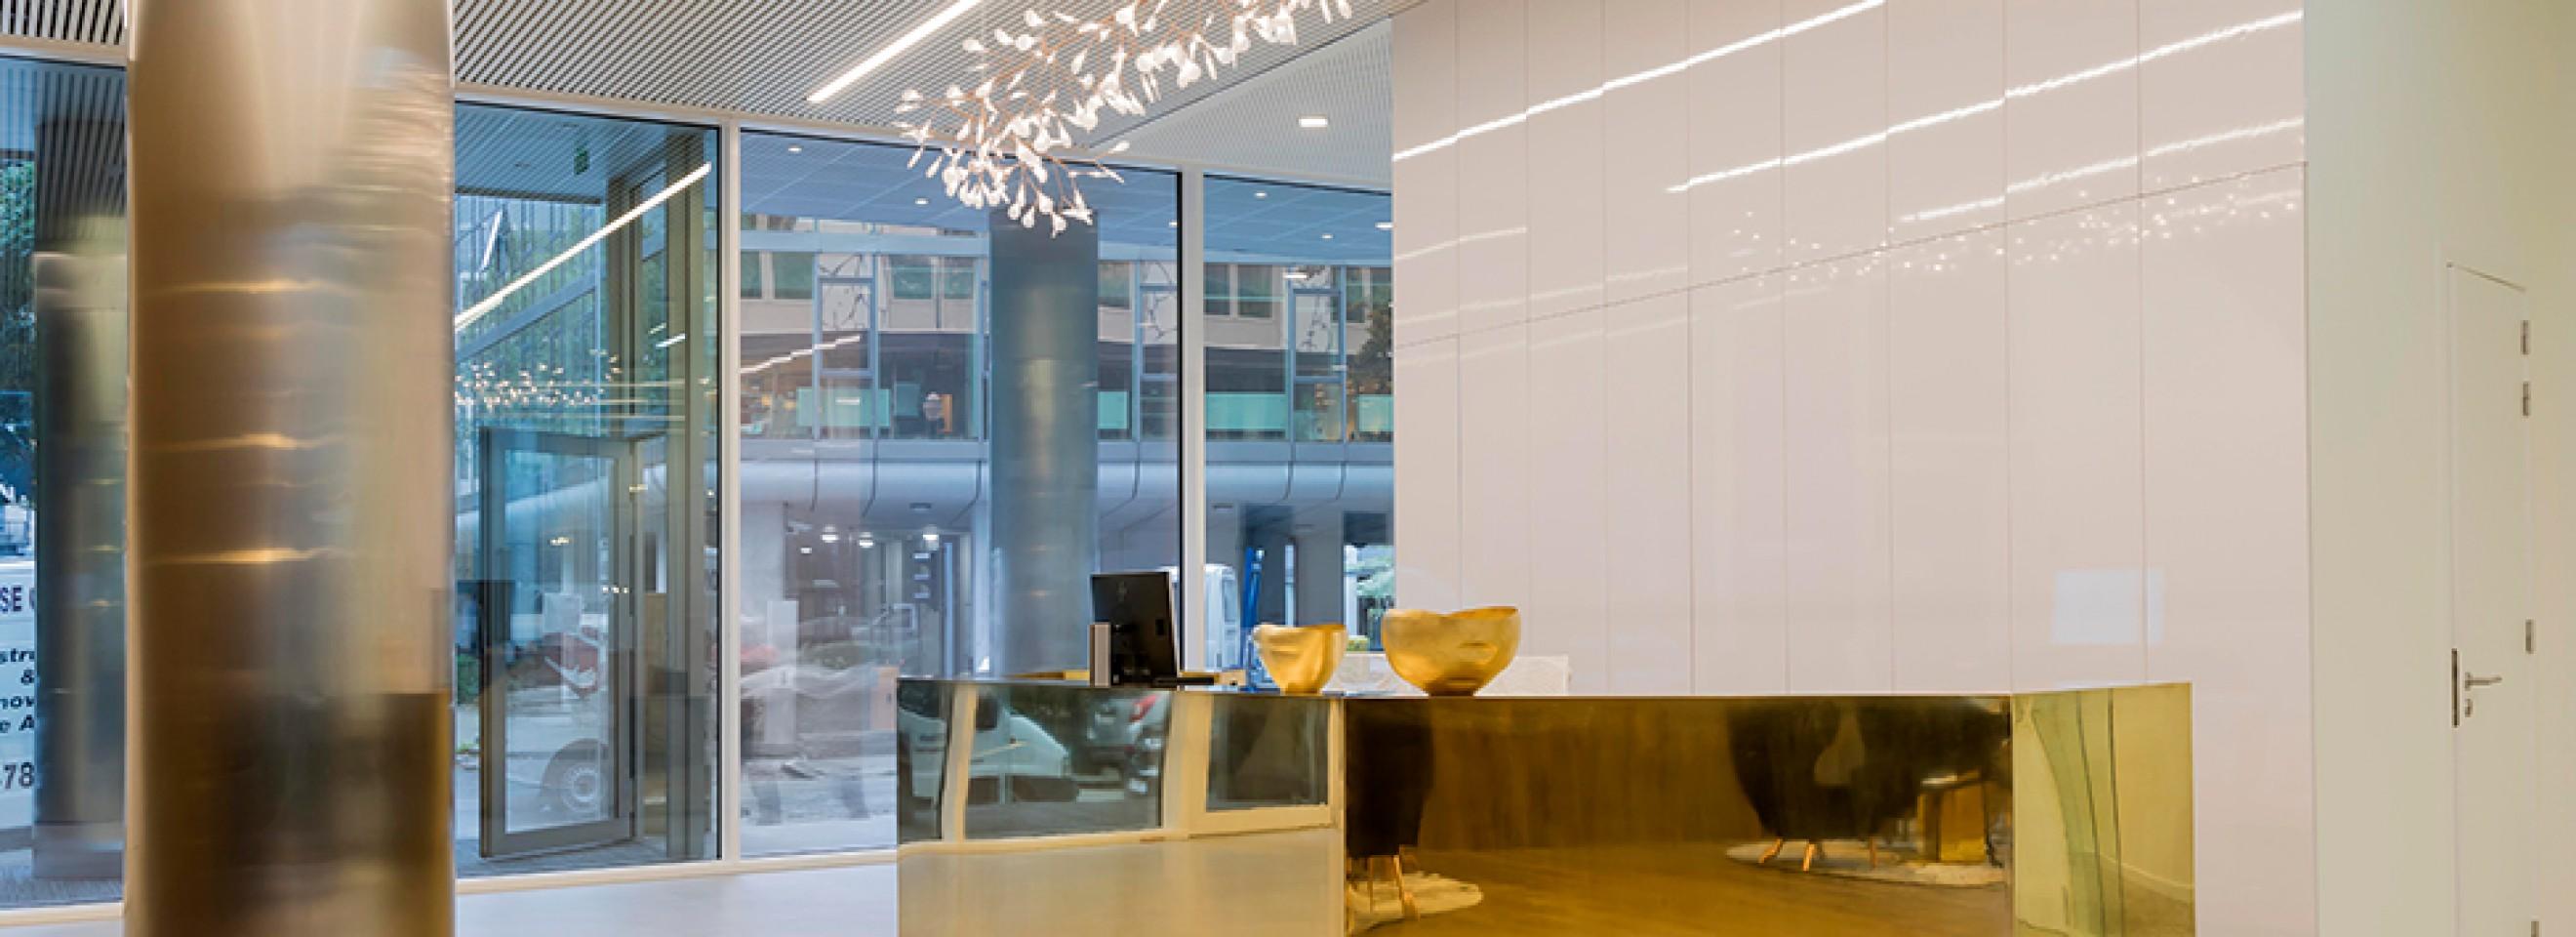 Heracleum Endlesl lamp boven de ontvangstbalie van Treesquare Victors Design Agency